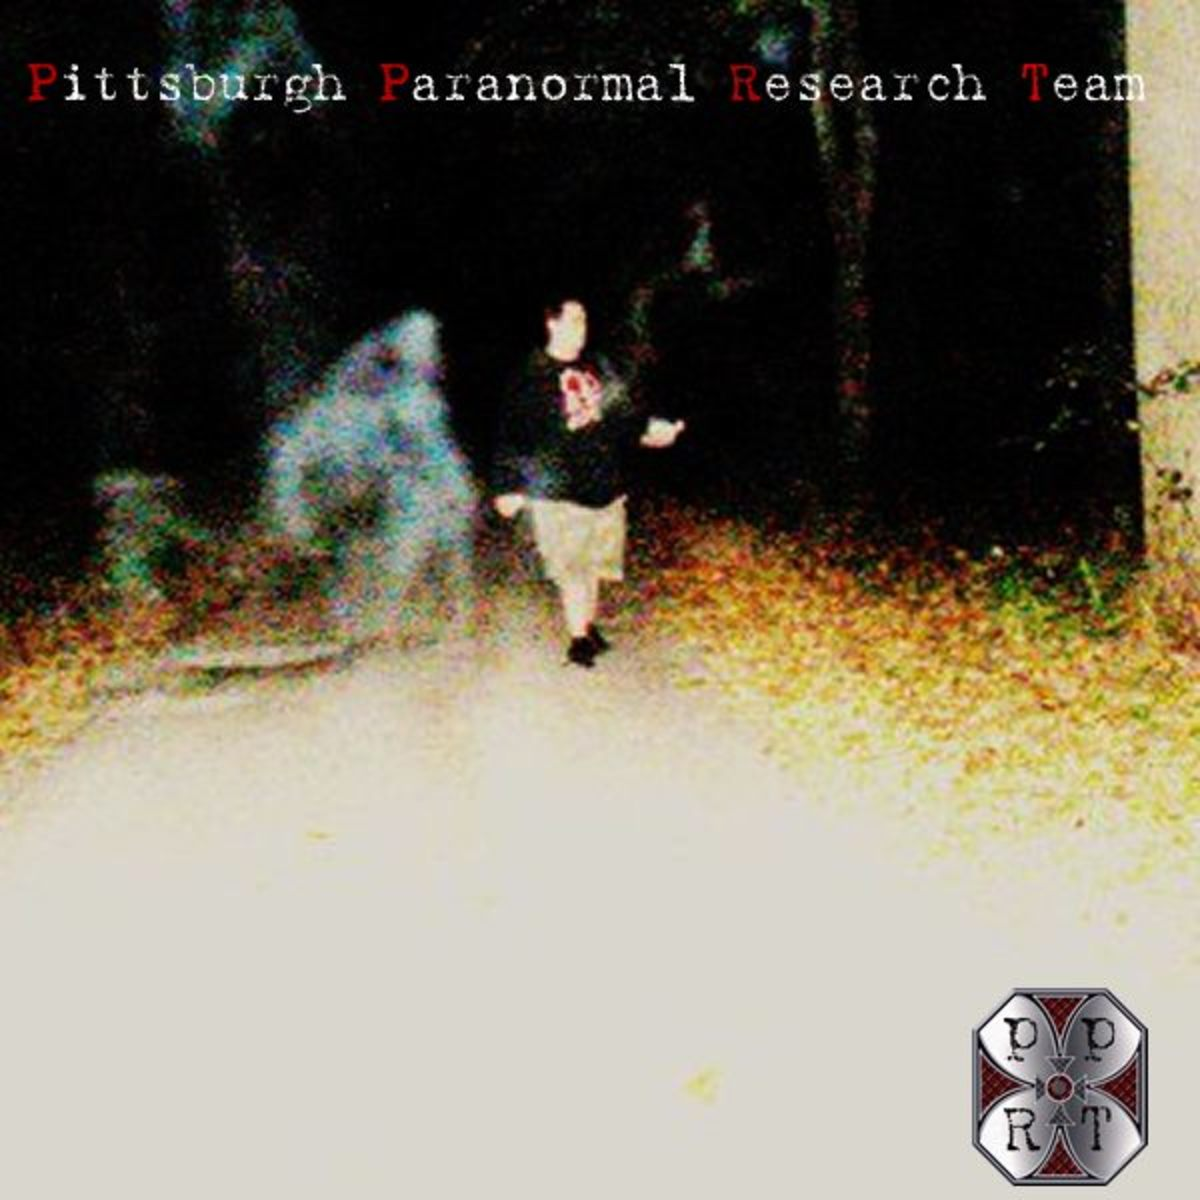 Stalker ghost?